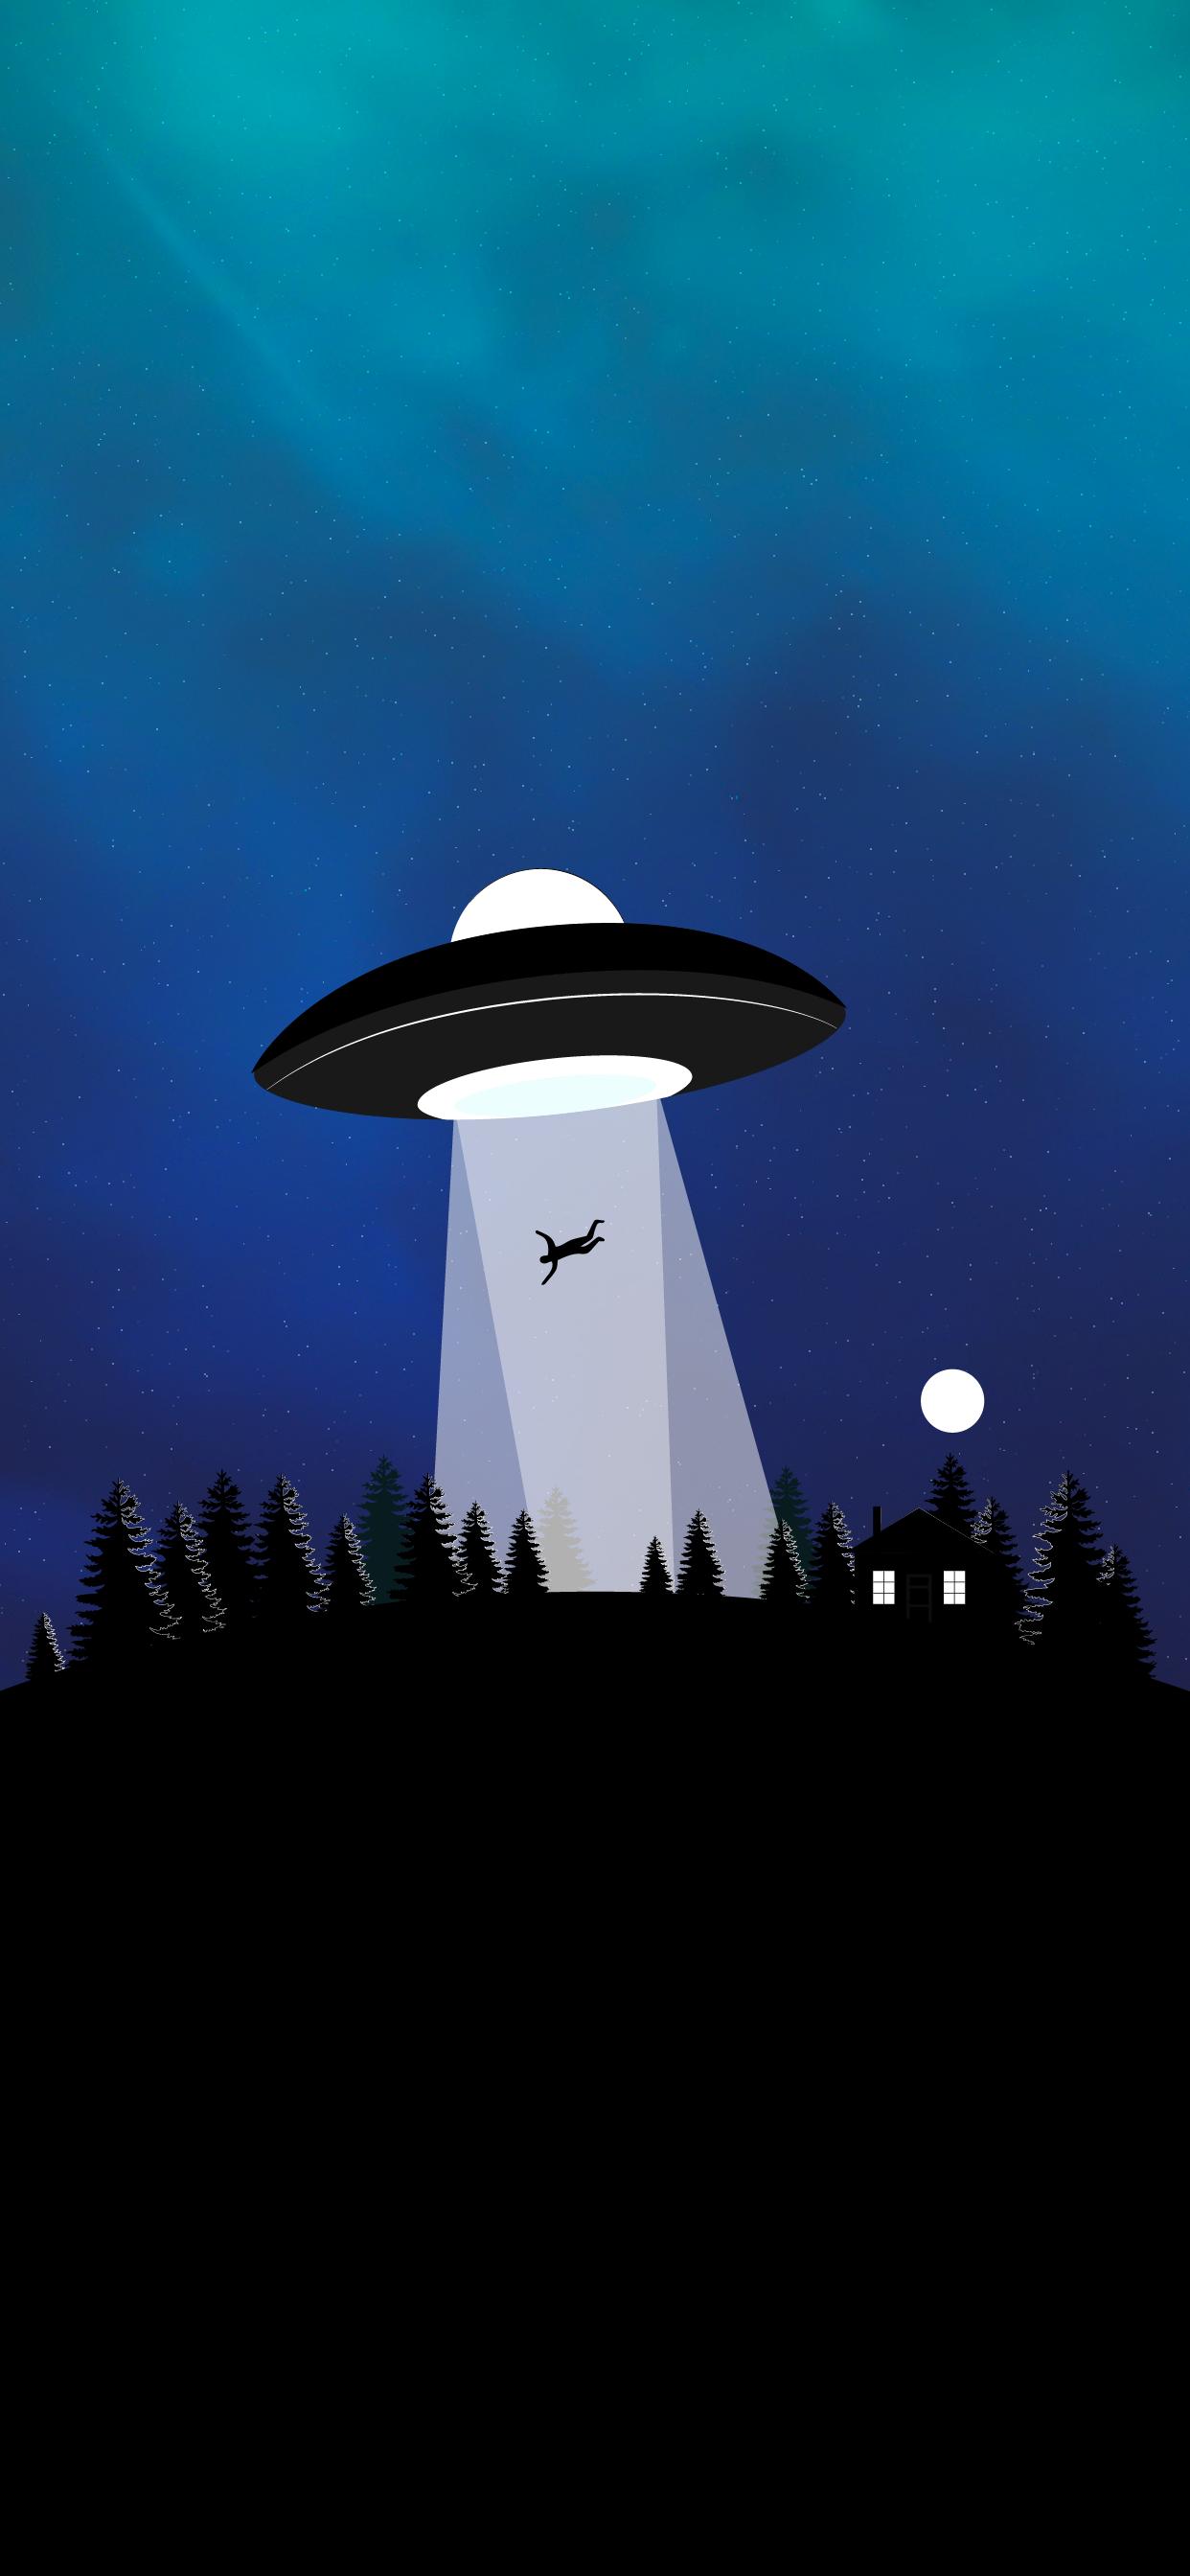 cool iphone wallpaper hd ufo abduction minimalist